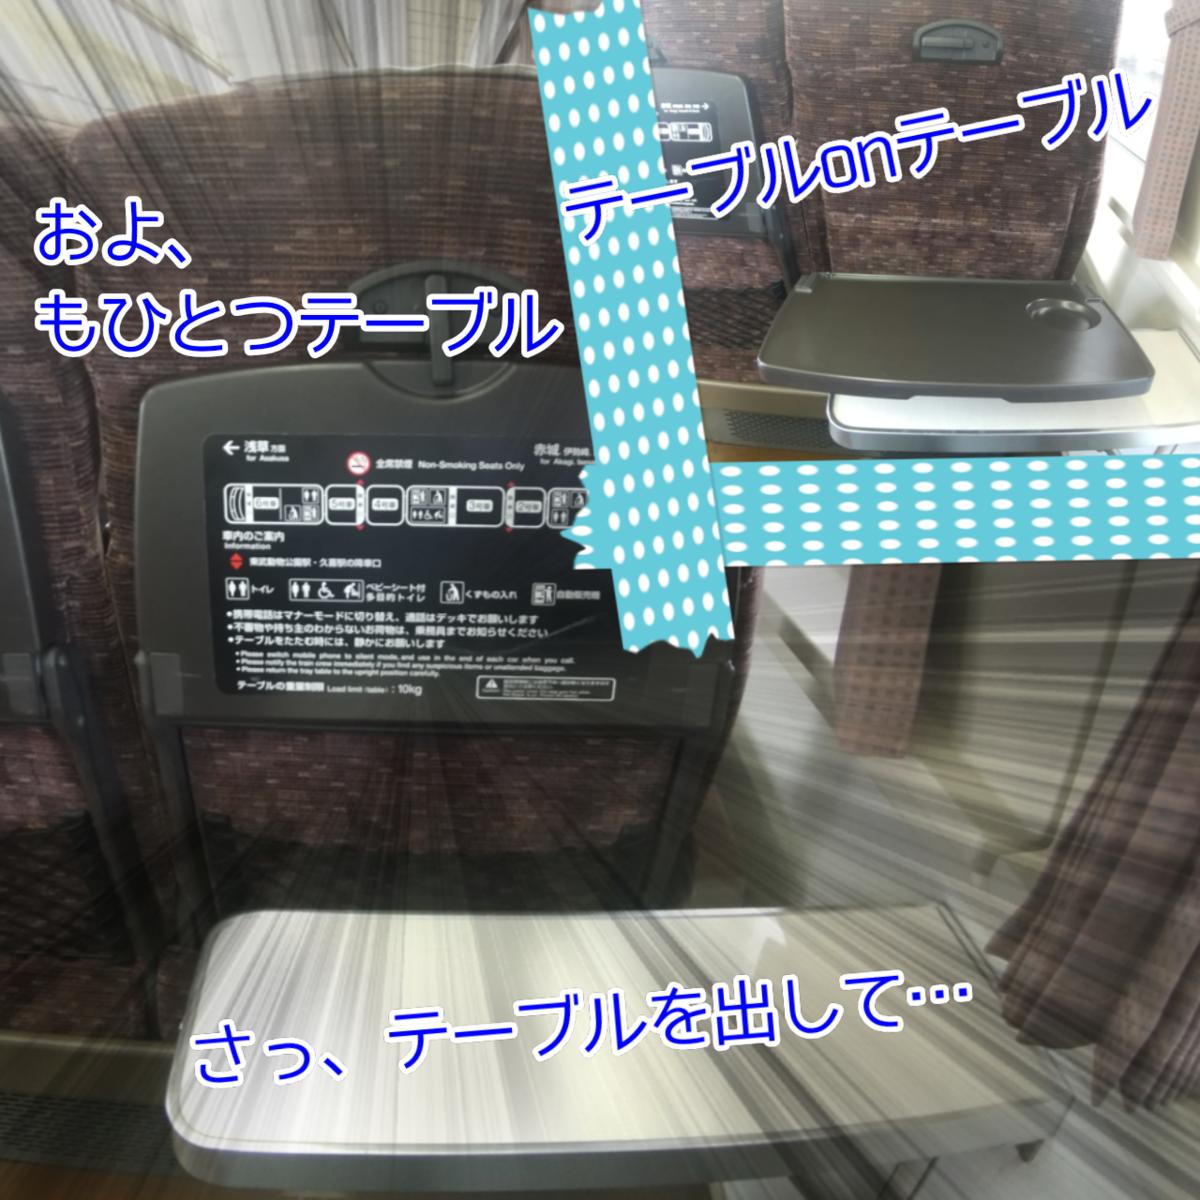 f:id:kohanakotaro:20210717150629p:plain